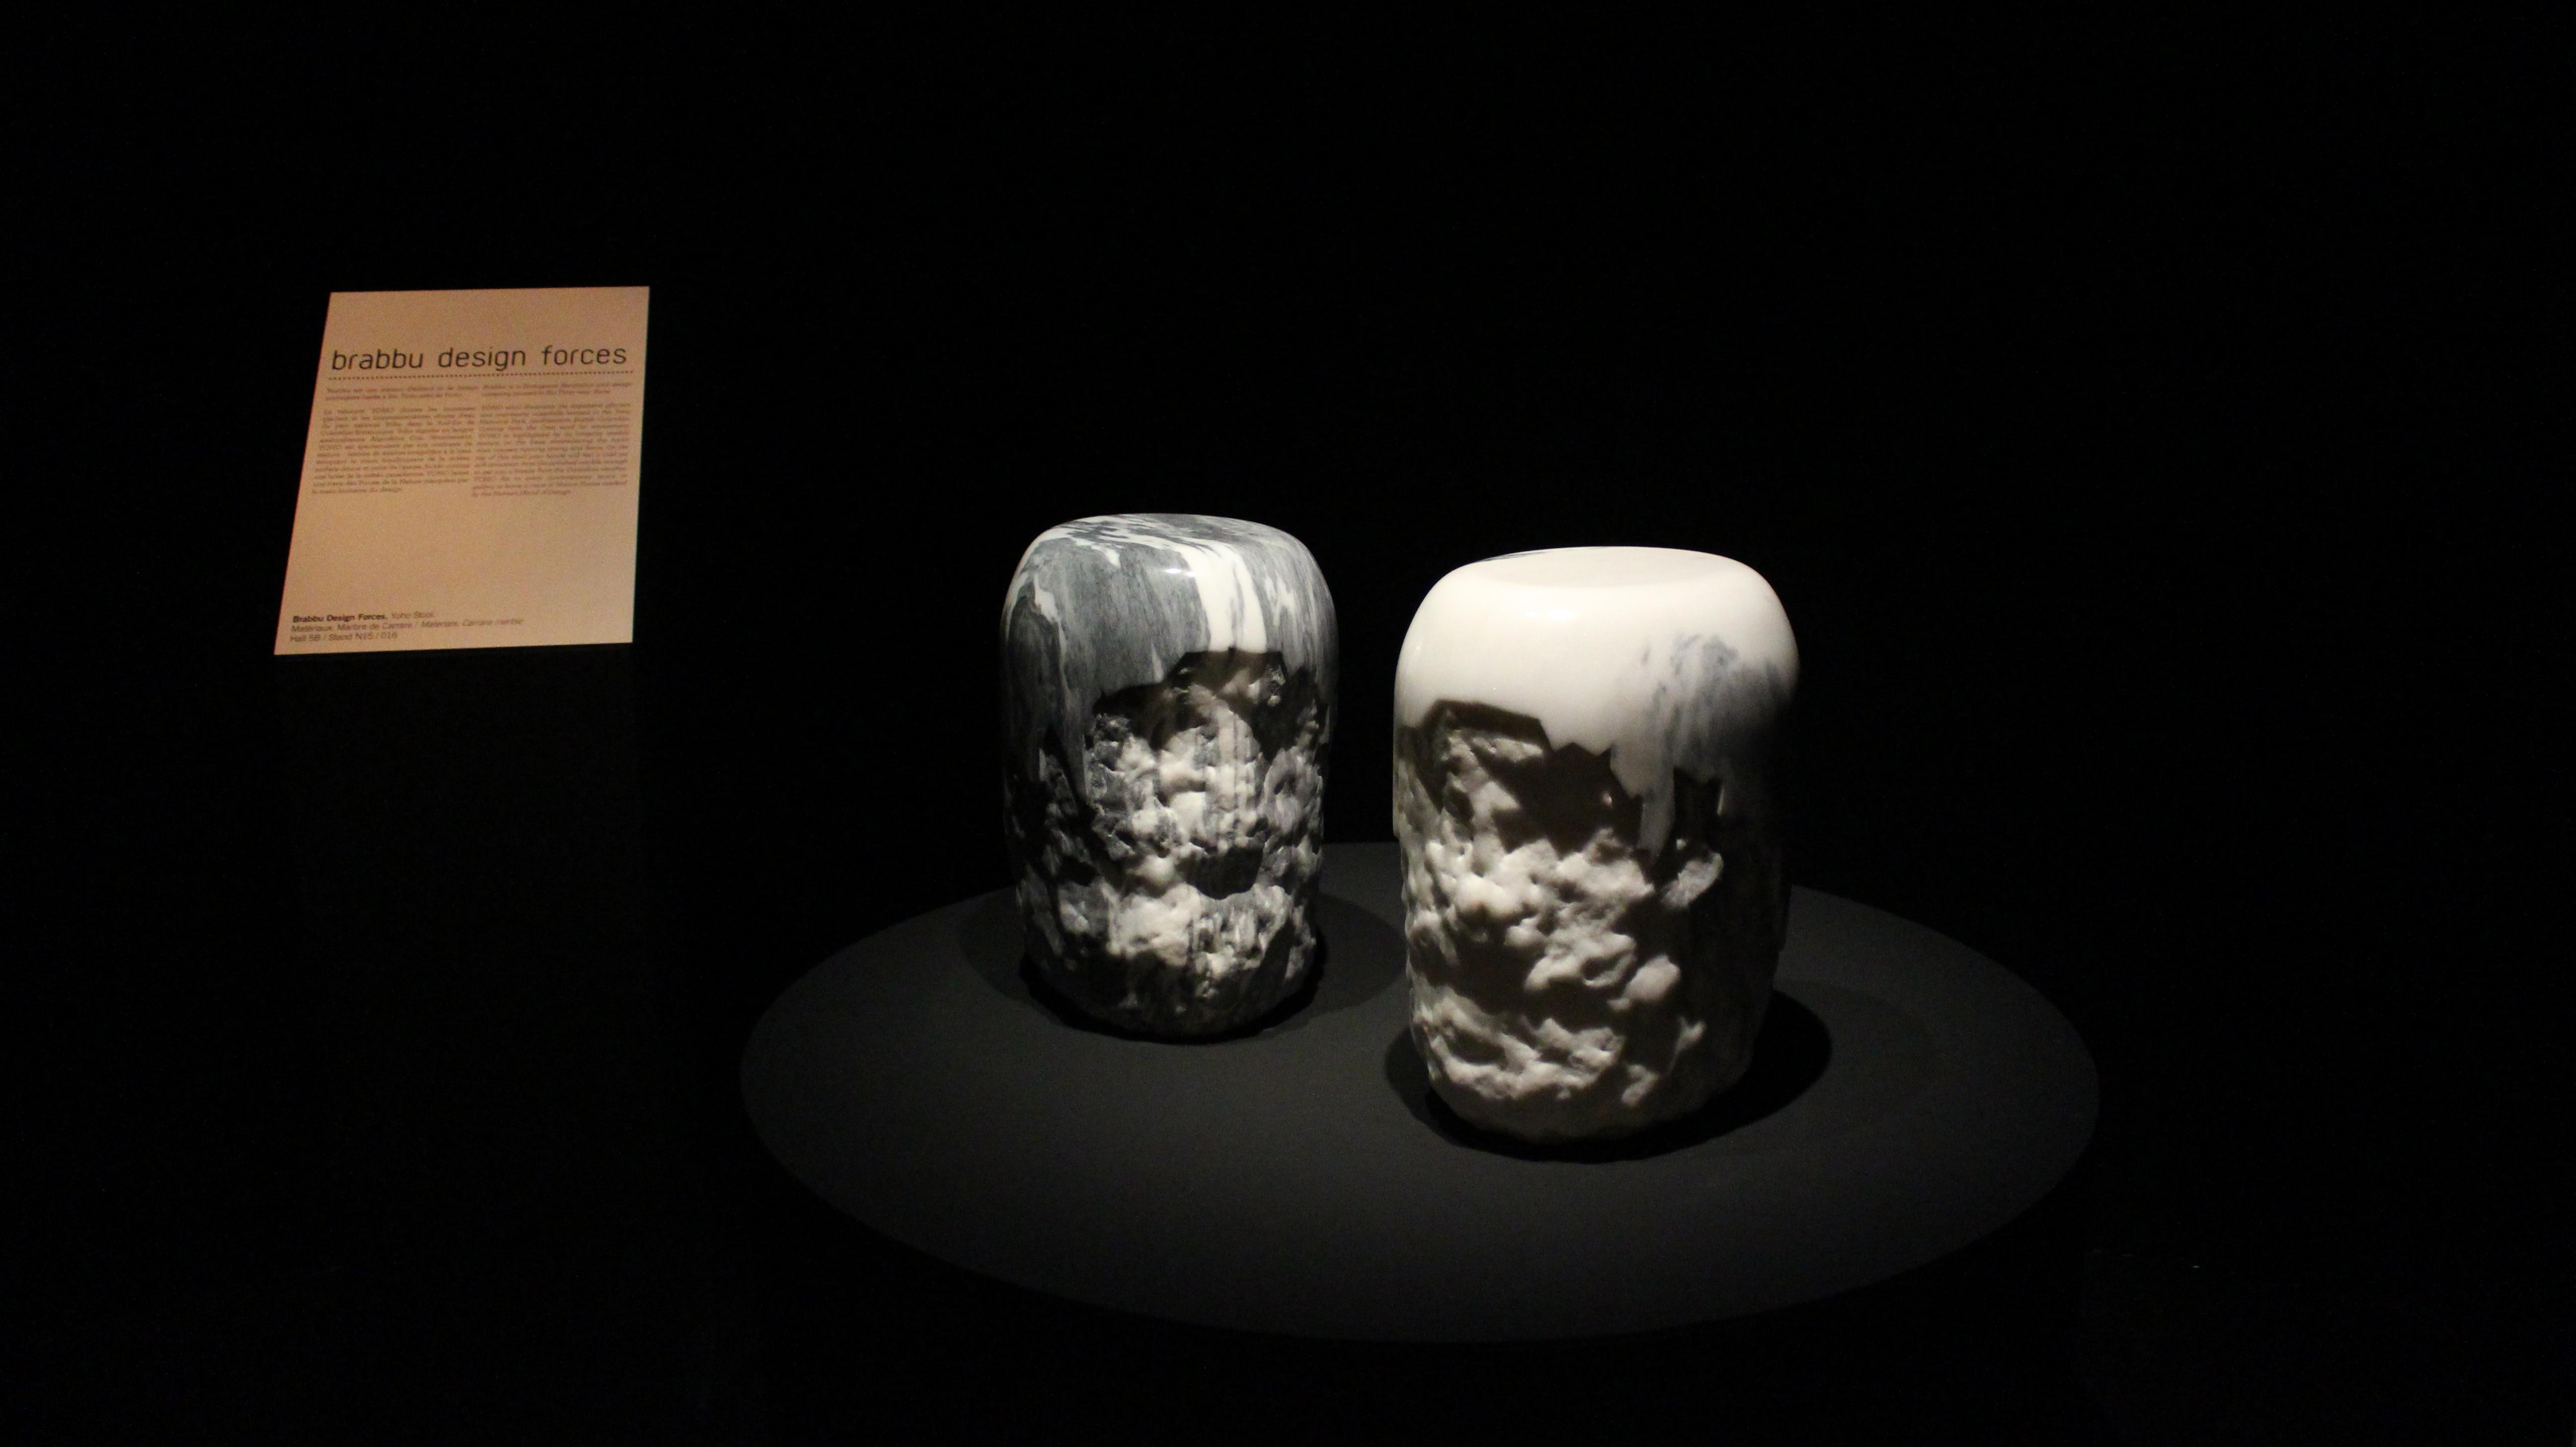 François Bernard-stand-maison objet-parismake nature FRANÇOIS BERNARD AT MAISON&OBJET PARIS 2015 FRANÇOIS BERNARD AT MAISON&OBJET PARIS 2015 IMG 6441